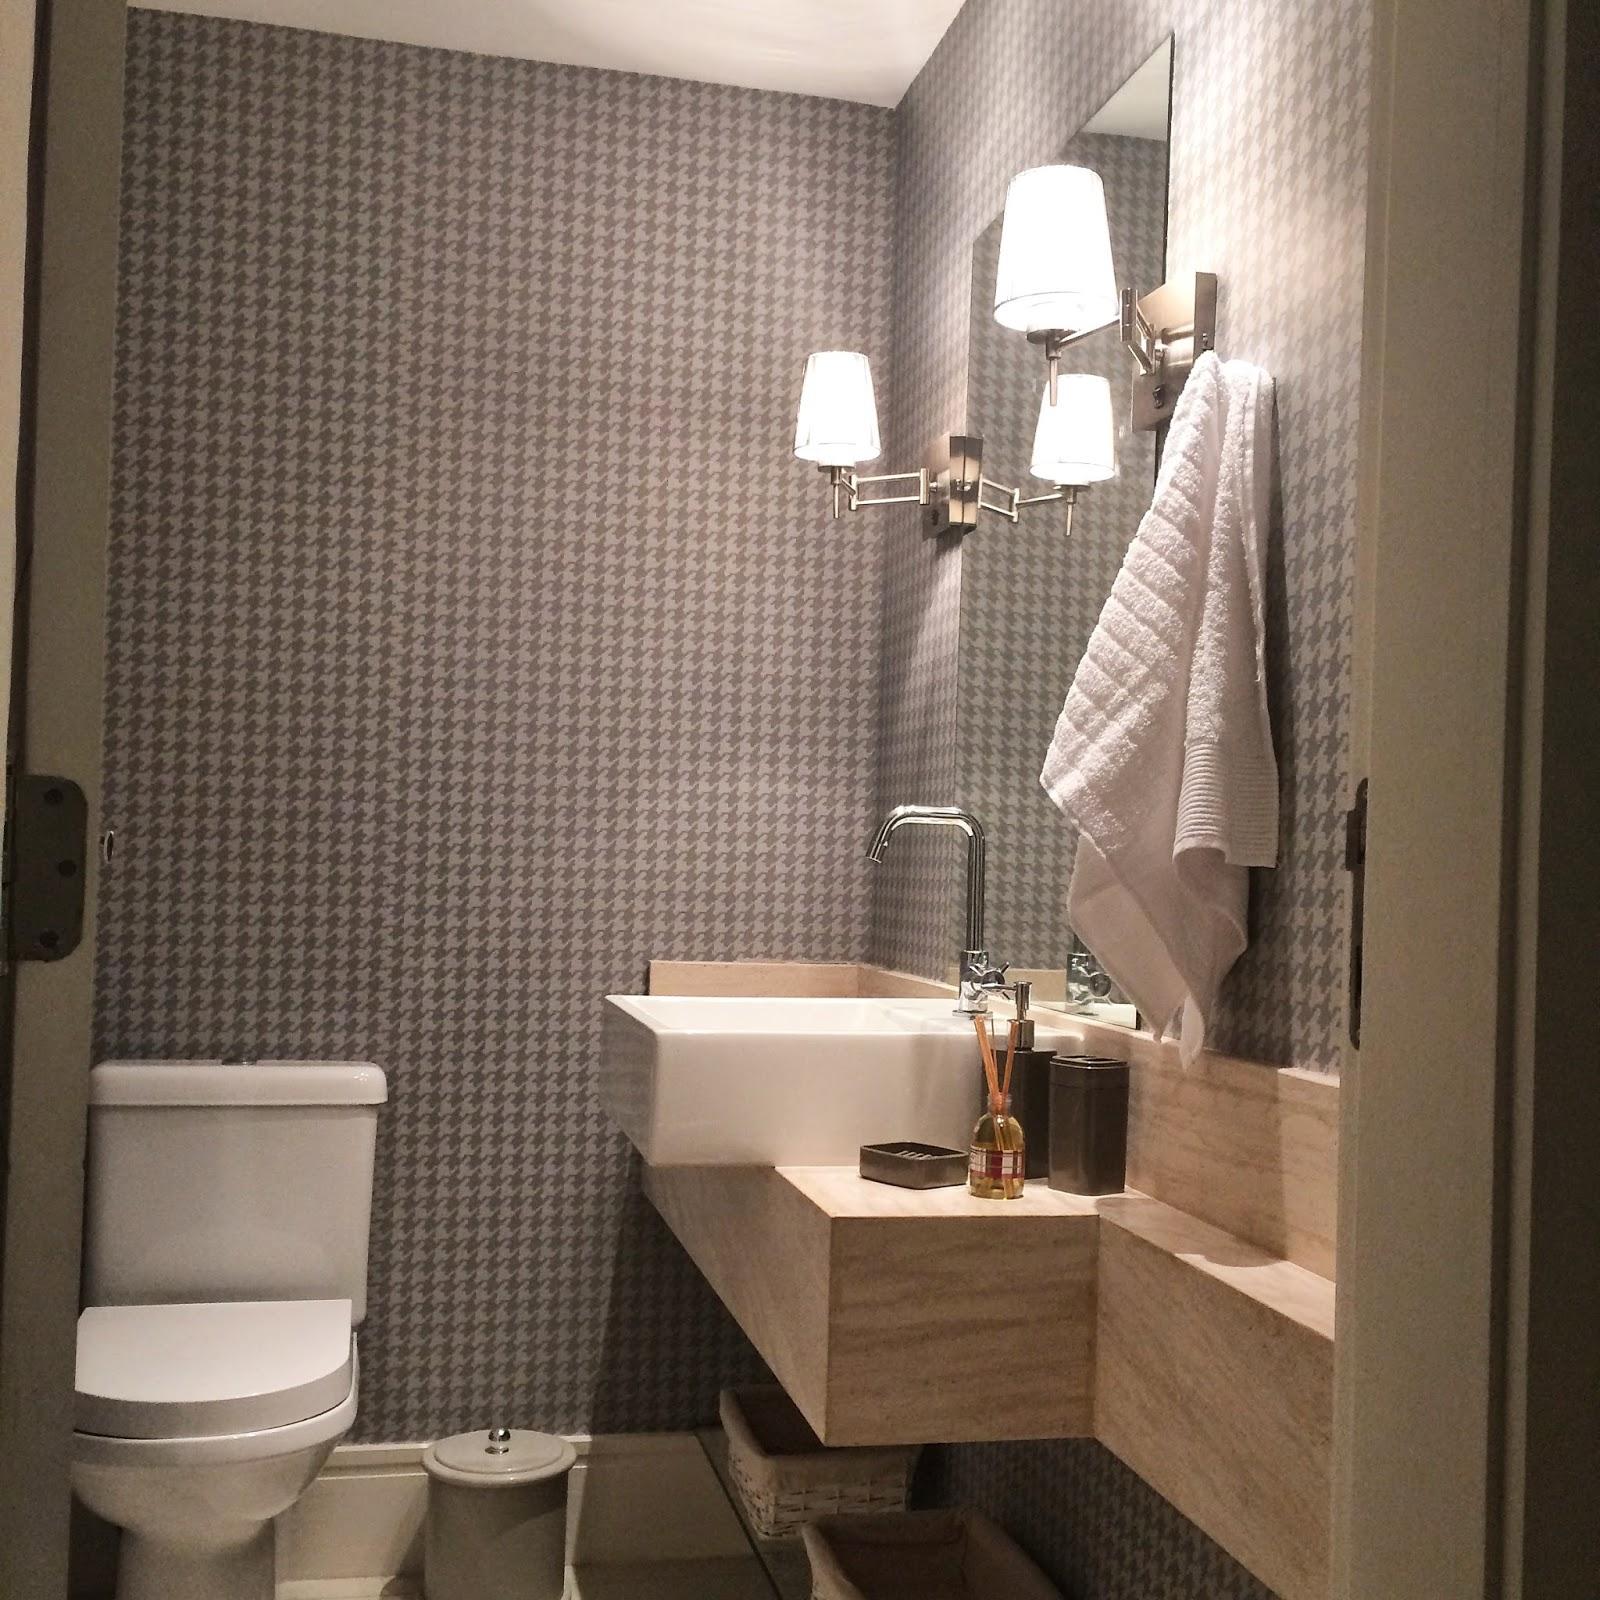 blog luz design lavabo bacana gastando pouco. Black Bedroom Furniture Sets. Home Design Ideas